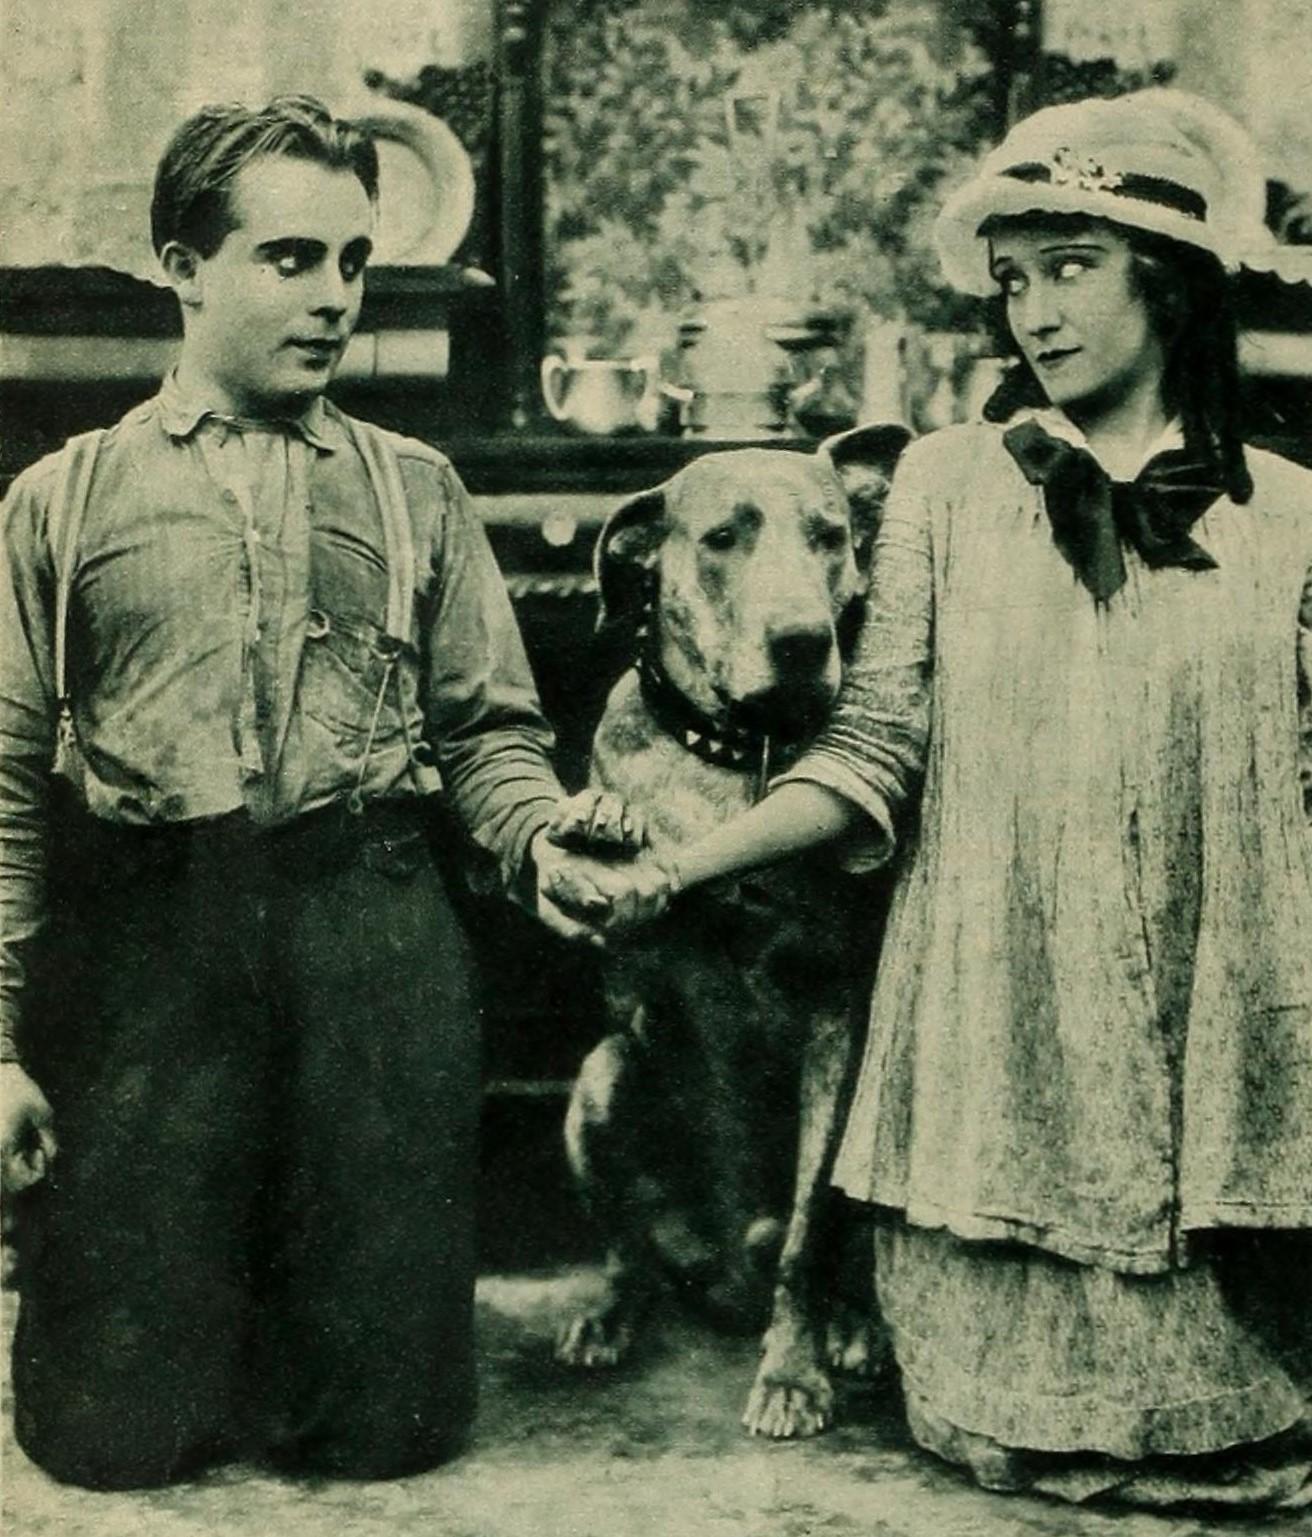 File:Bobby Vernon, Teddy the Dog, and Gloria Swanson - Talking Screen,  September 1930.jpg - Wikimedia Commons